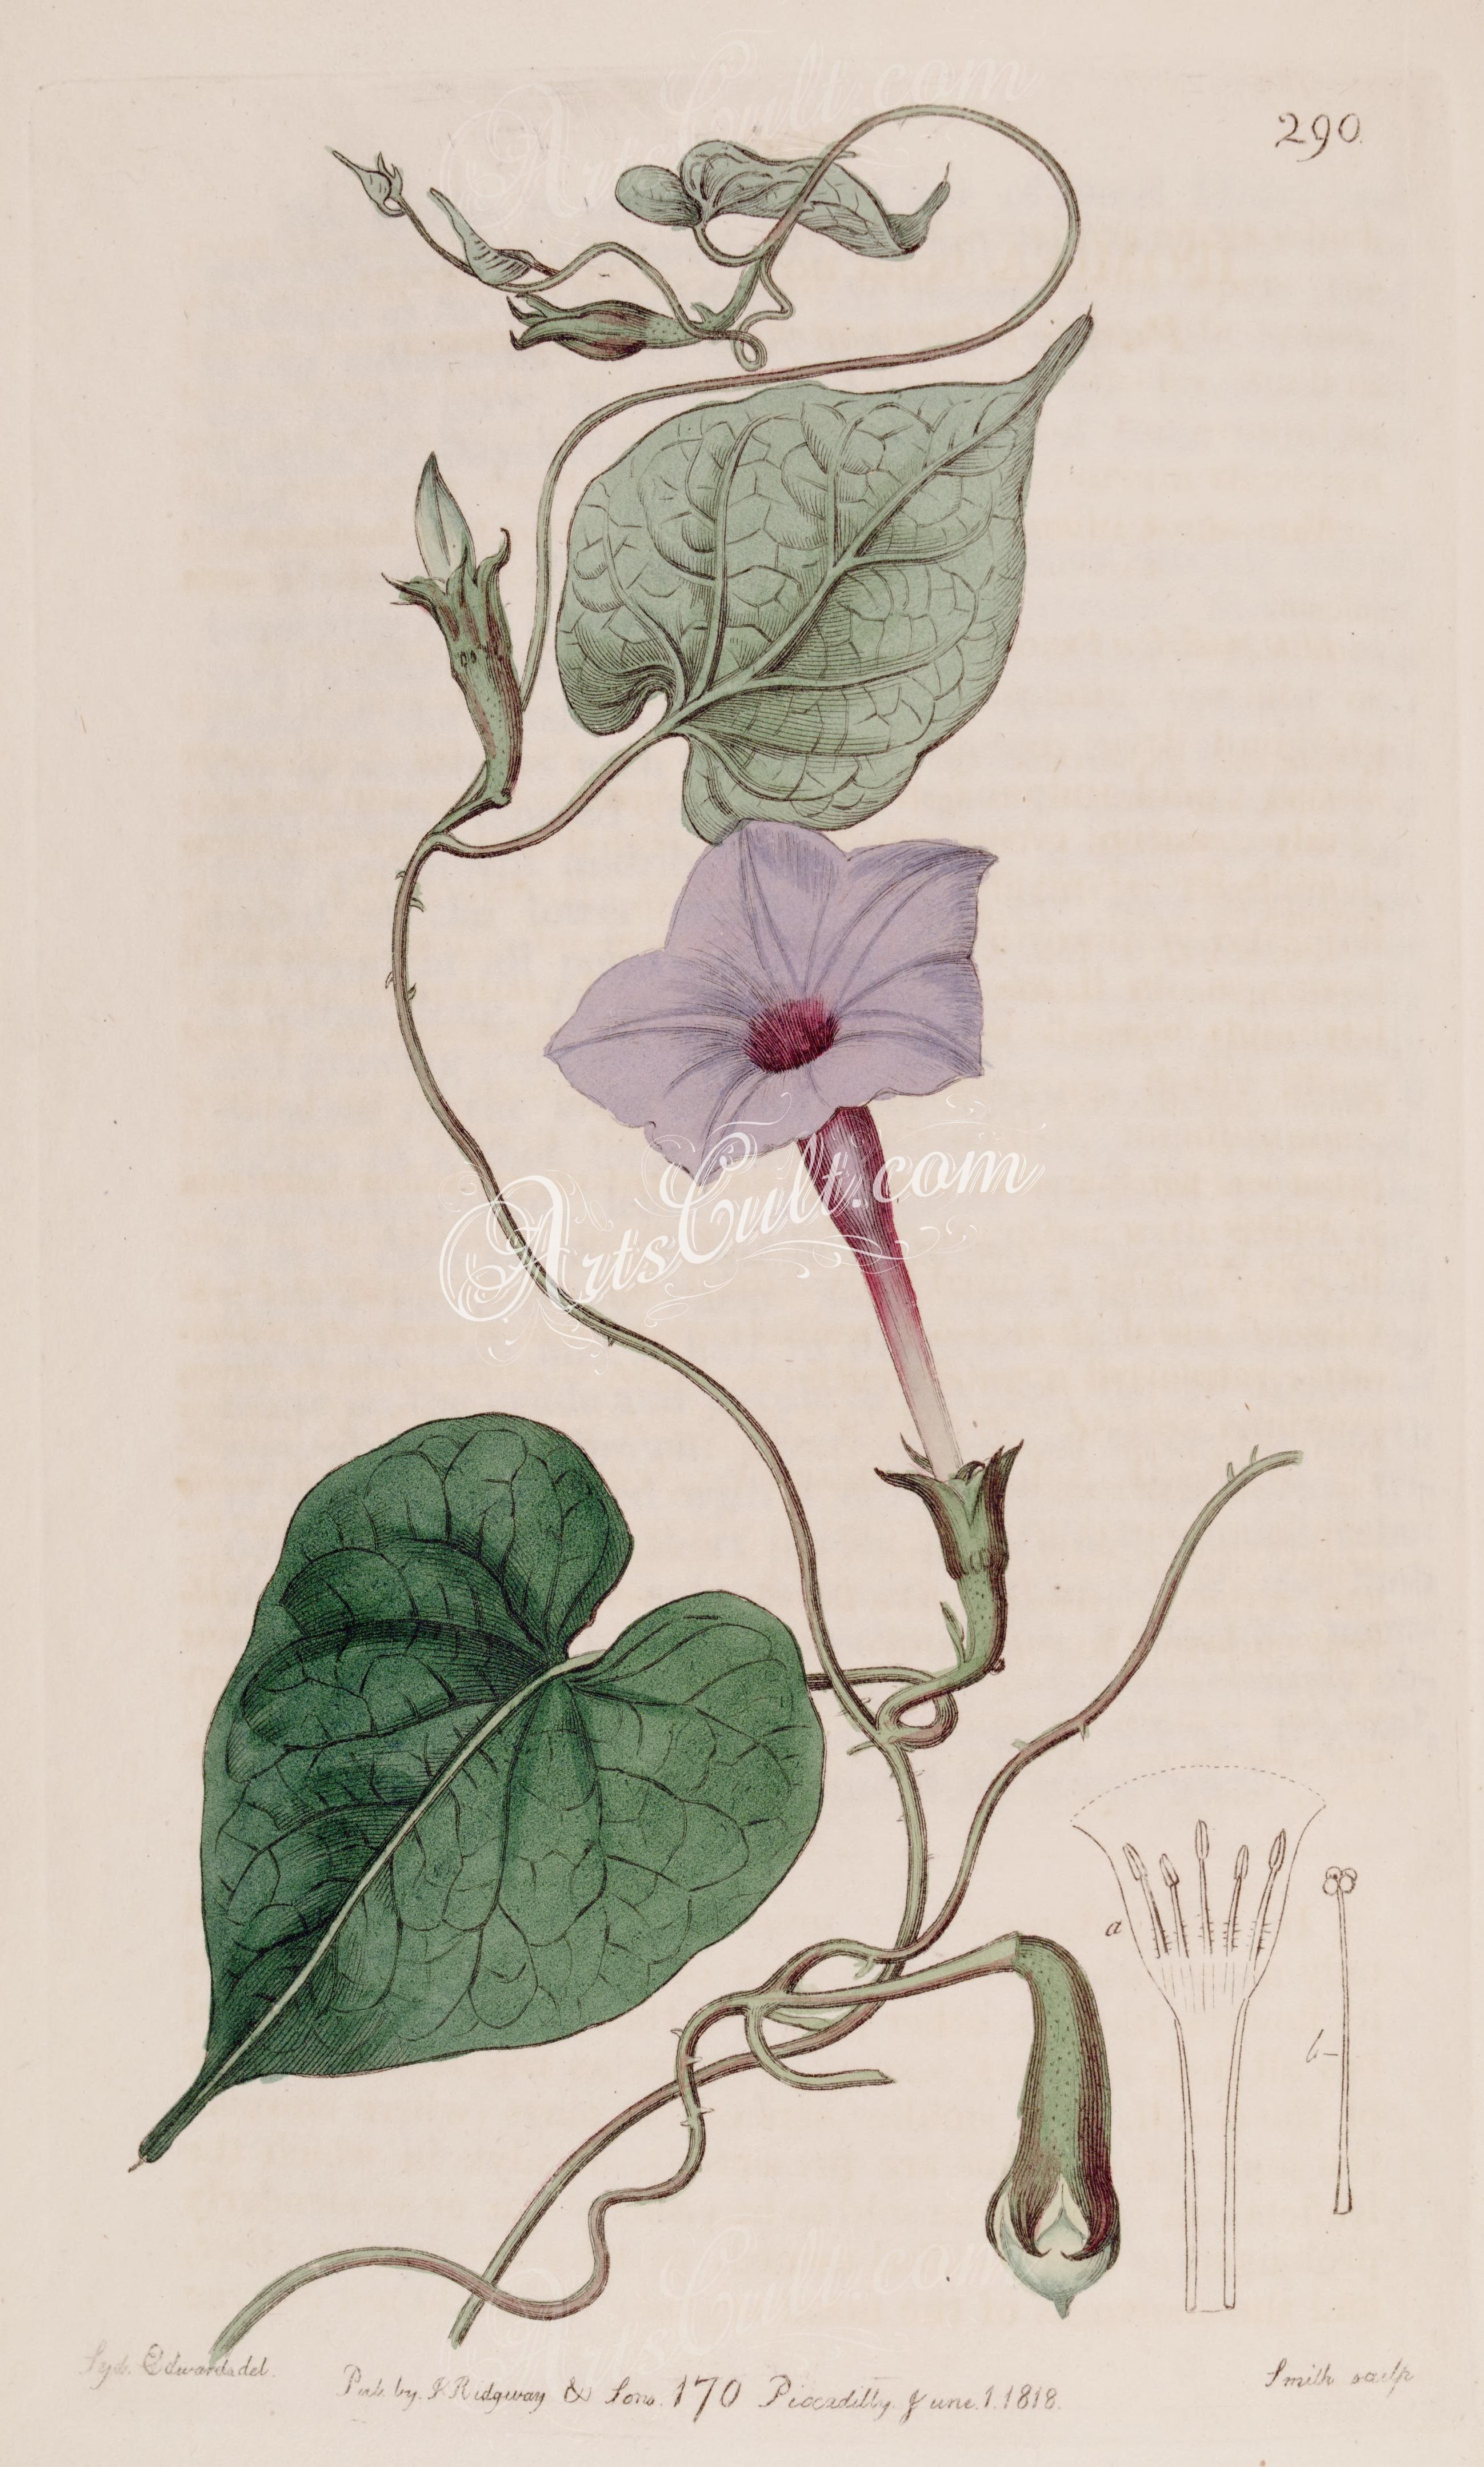 Flowers ipomoea bona nox purpurascens purple afternoon